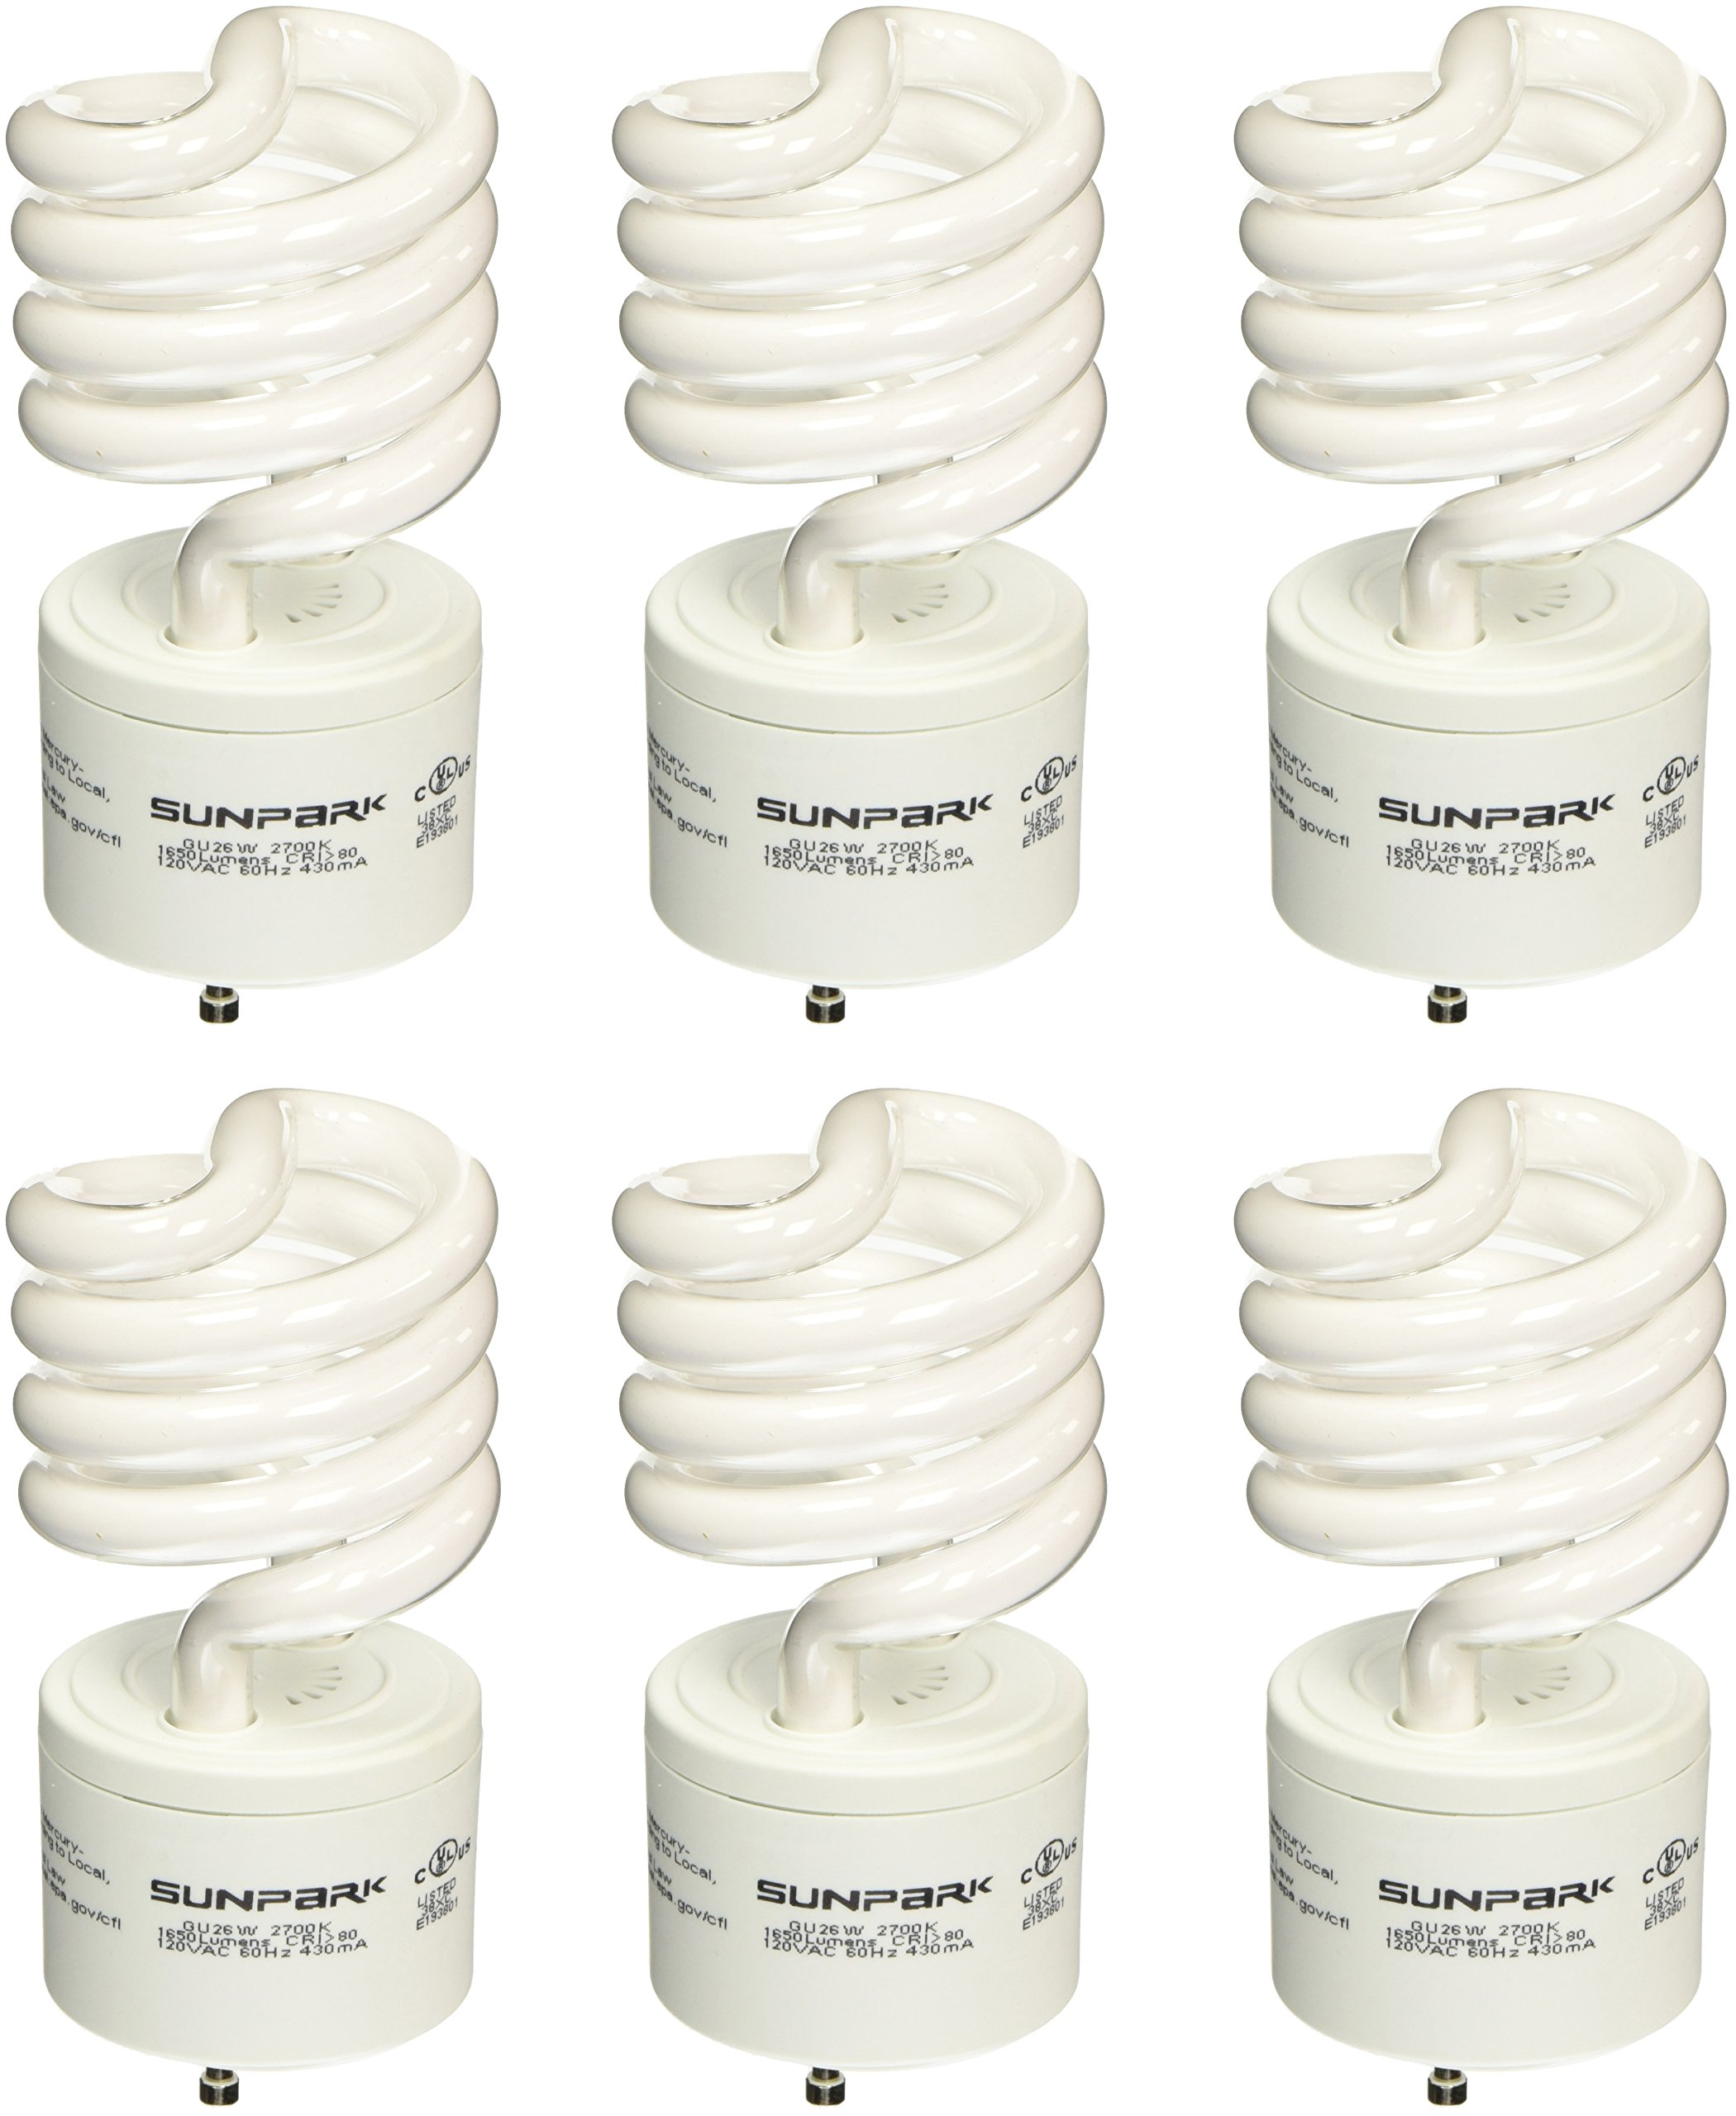 Sunpark 26-Watt GU26 CFL Light Bulb (100-Watt Incandescent Equivalent), Warm White, 6-Pack